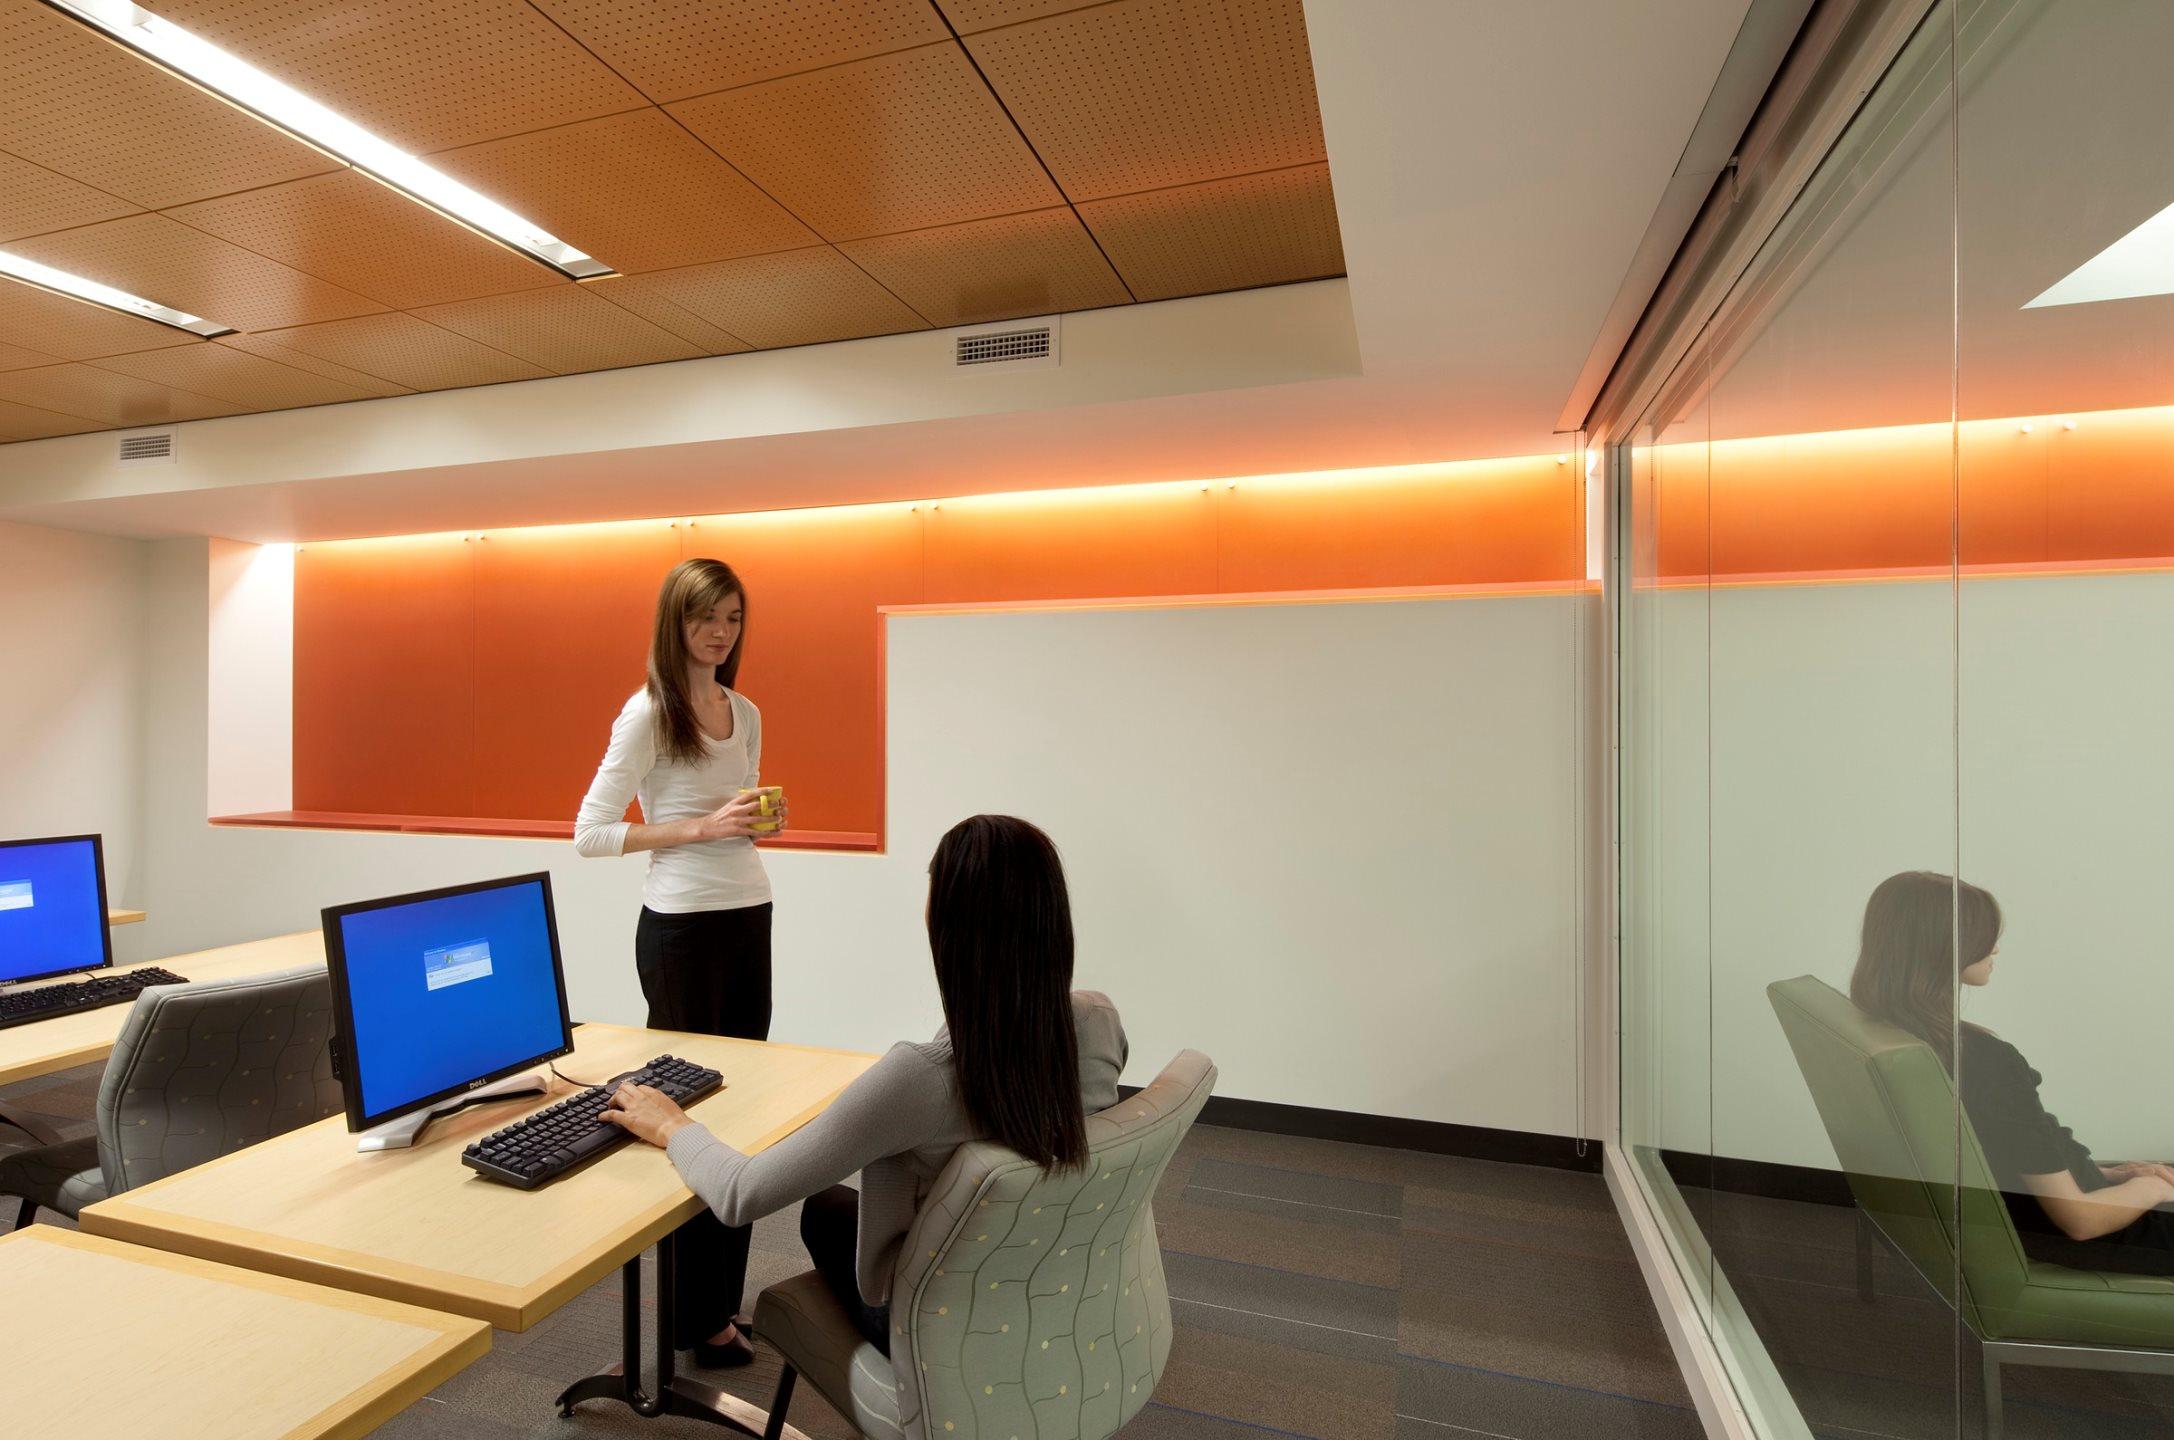 Beau Administrative Office Renovation | BNIM